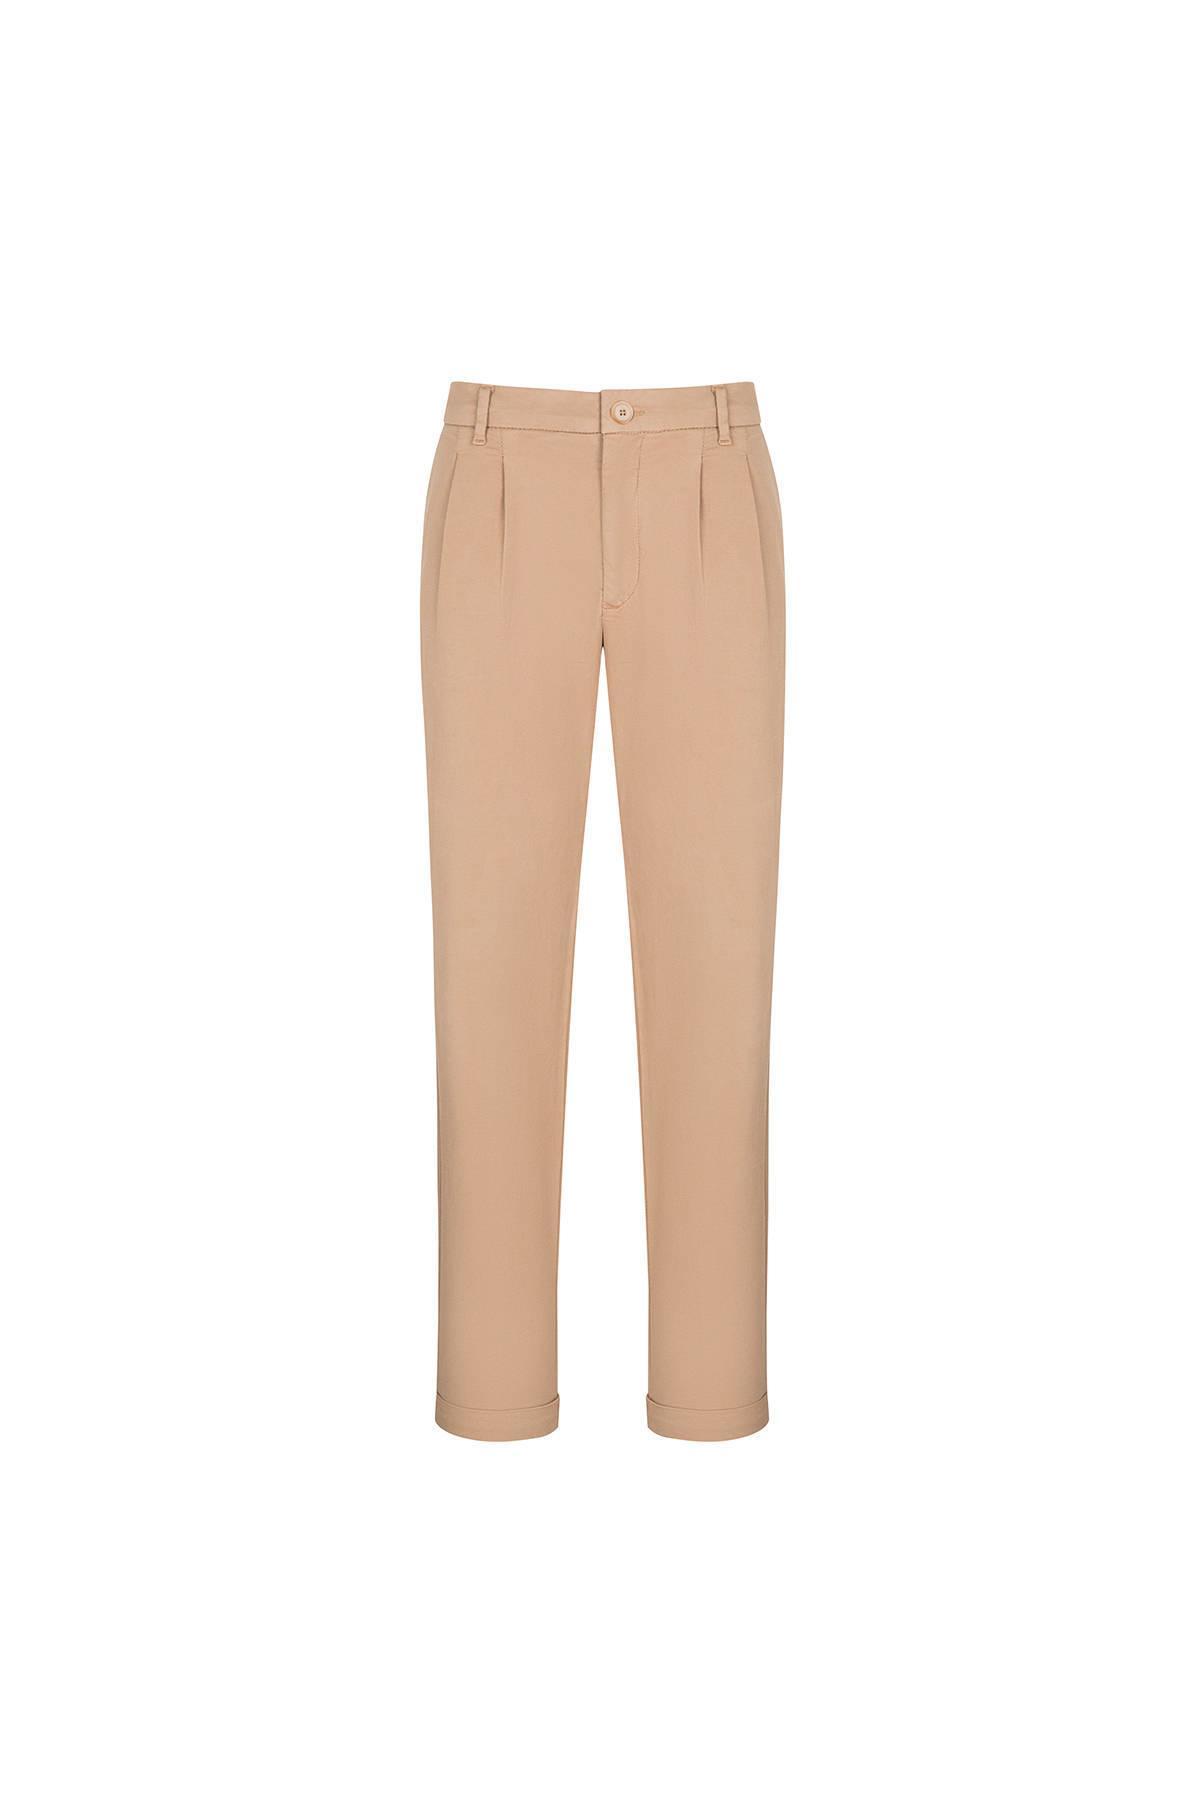 Pileli Camel Chino Pantolon